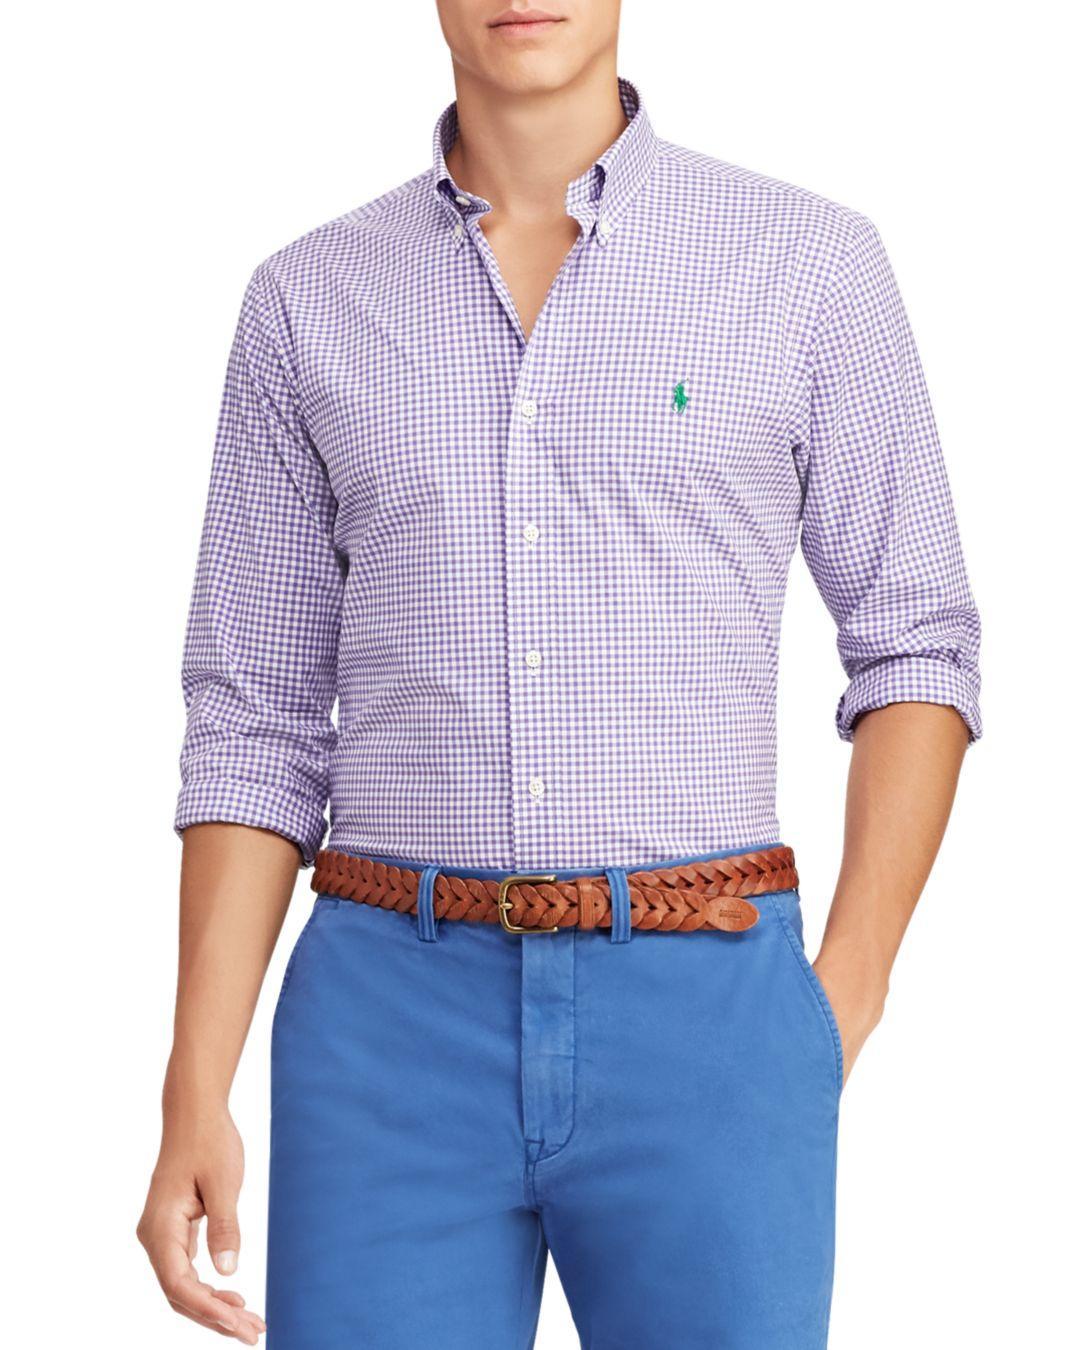 893aed850d Polo Ralph Lauren. Men's Purple Gingham Slim Fit Button-down Poplin Shirt